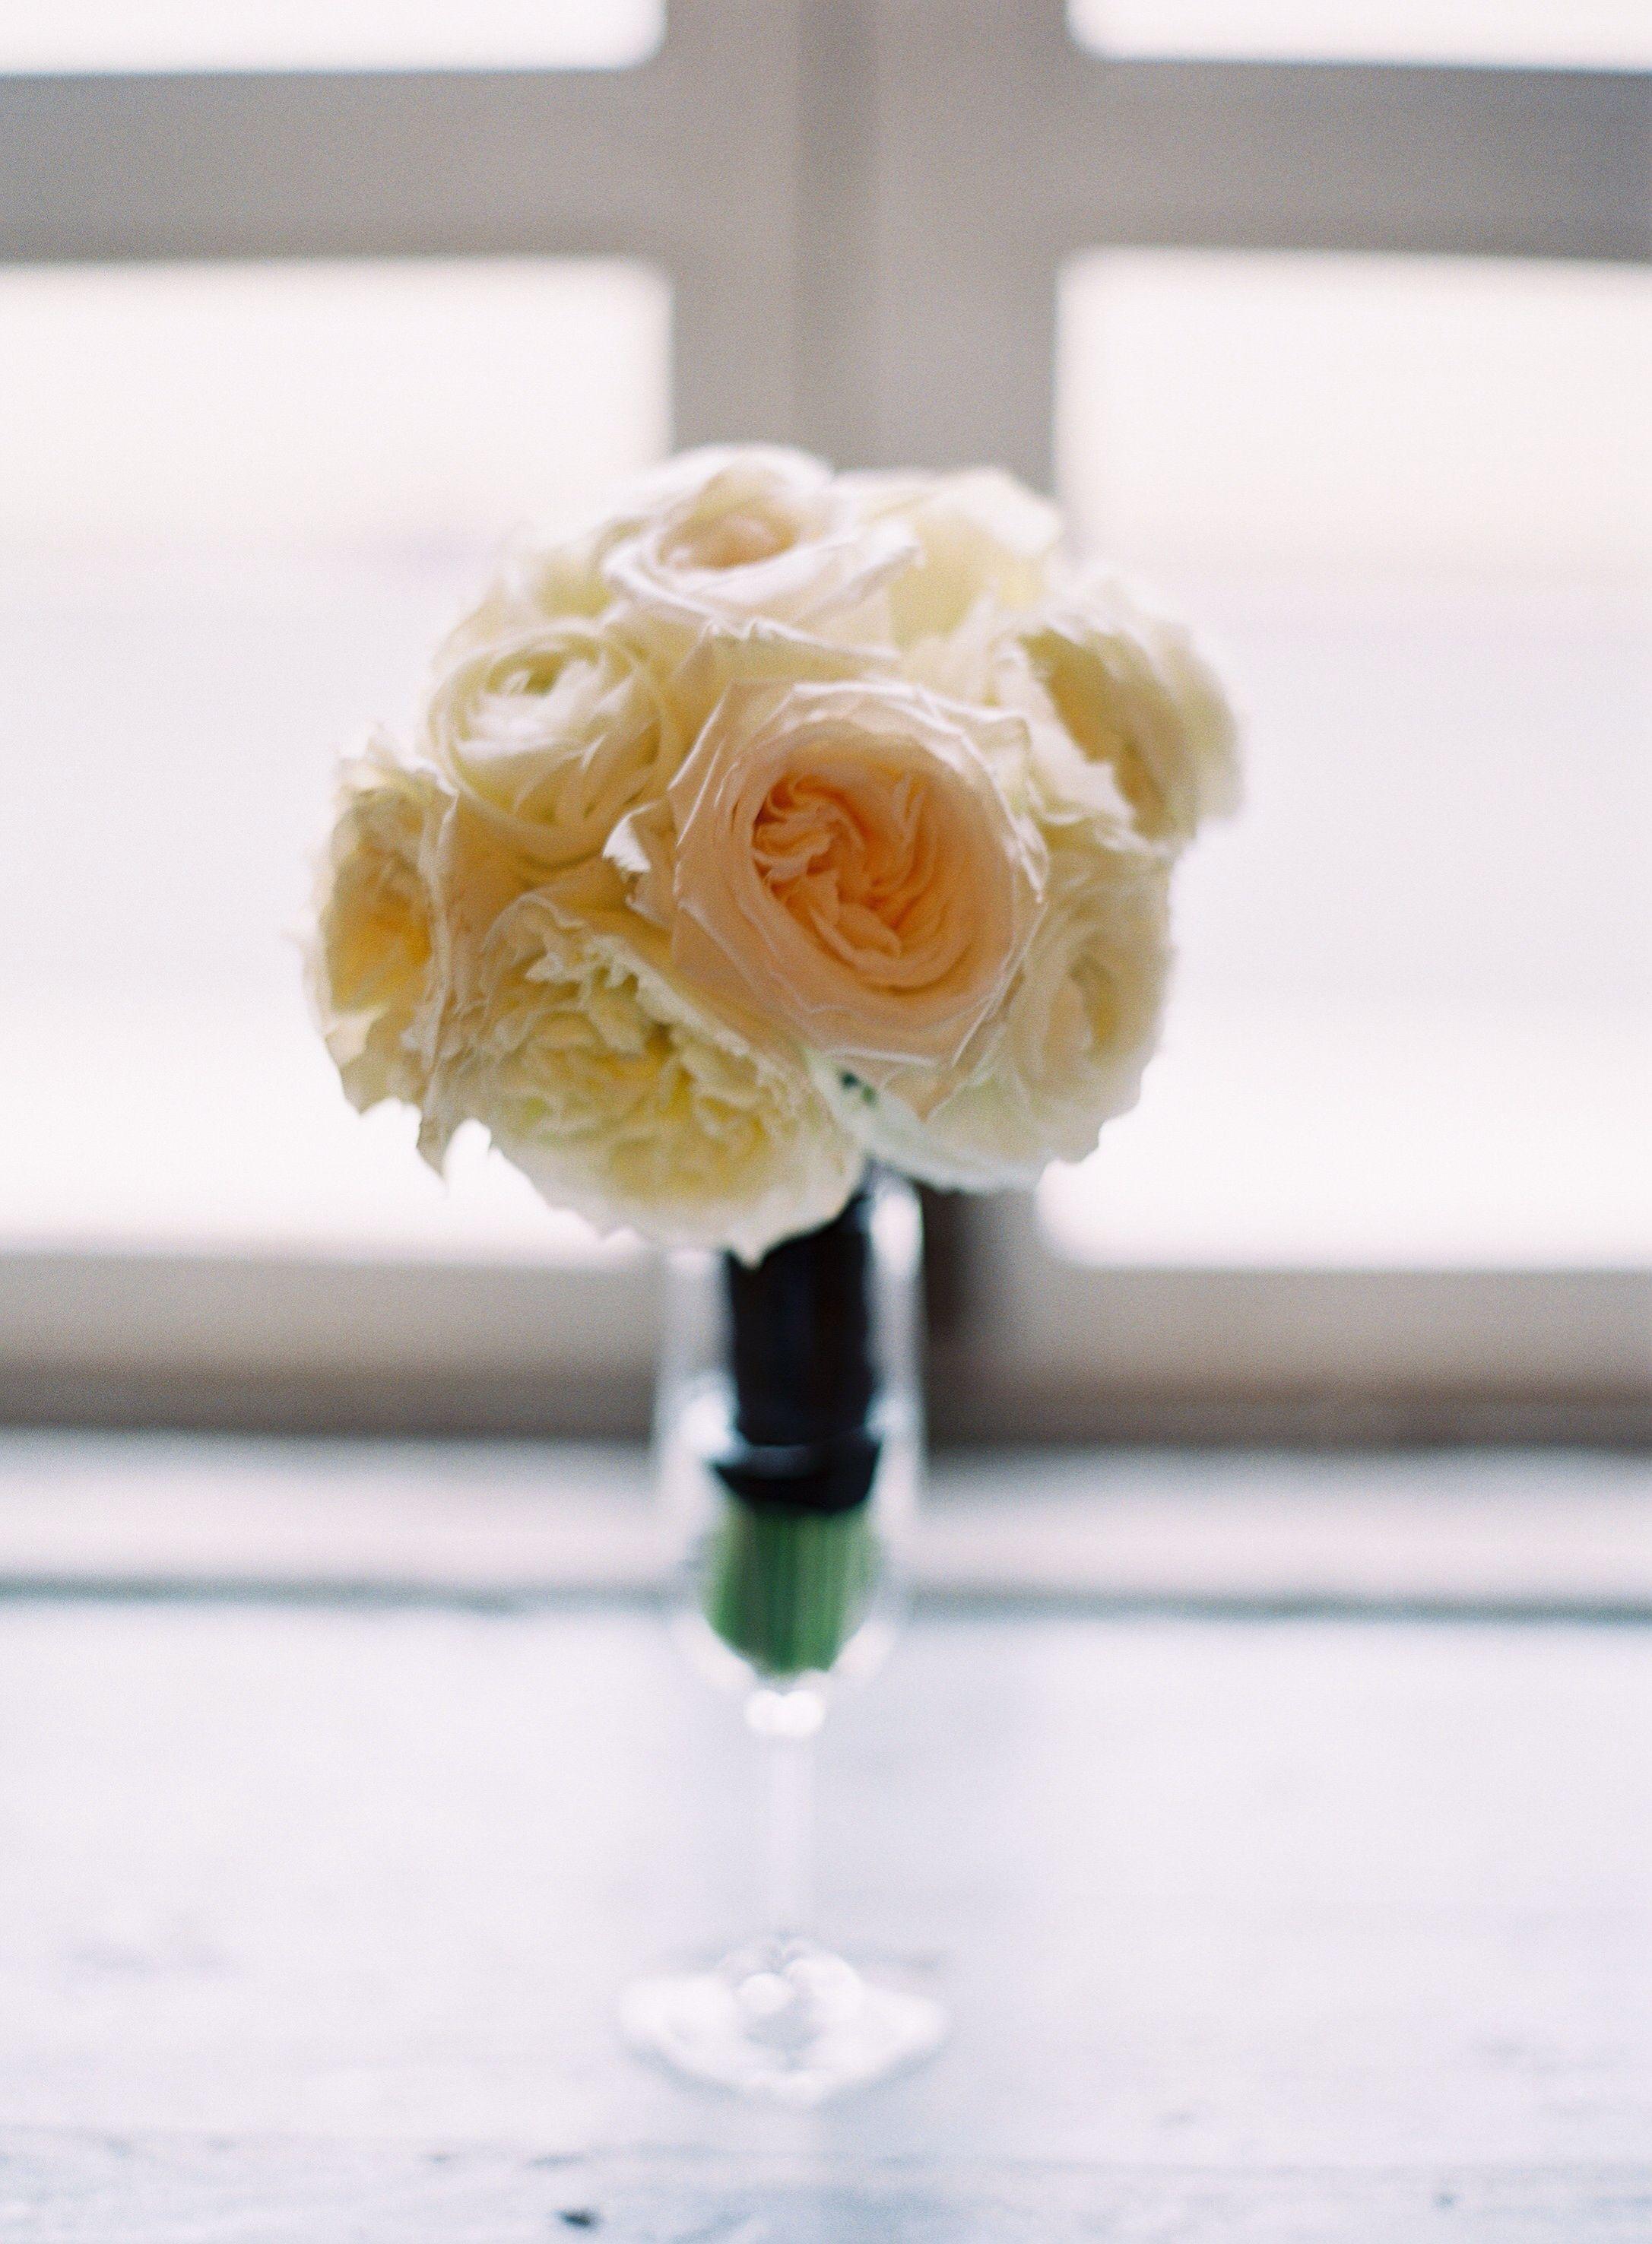 White rose - floreal design